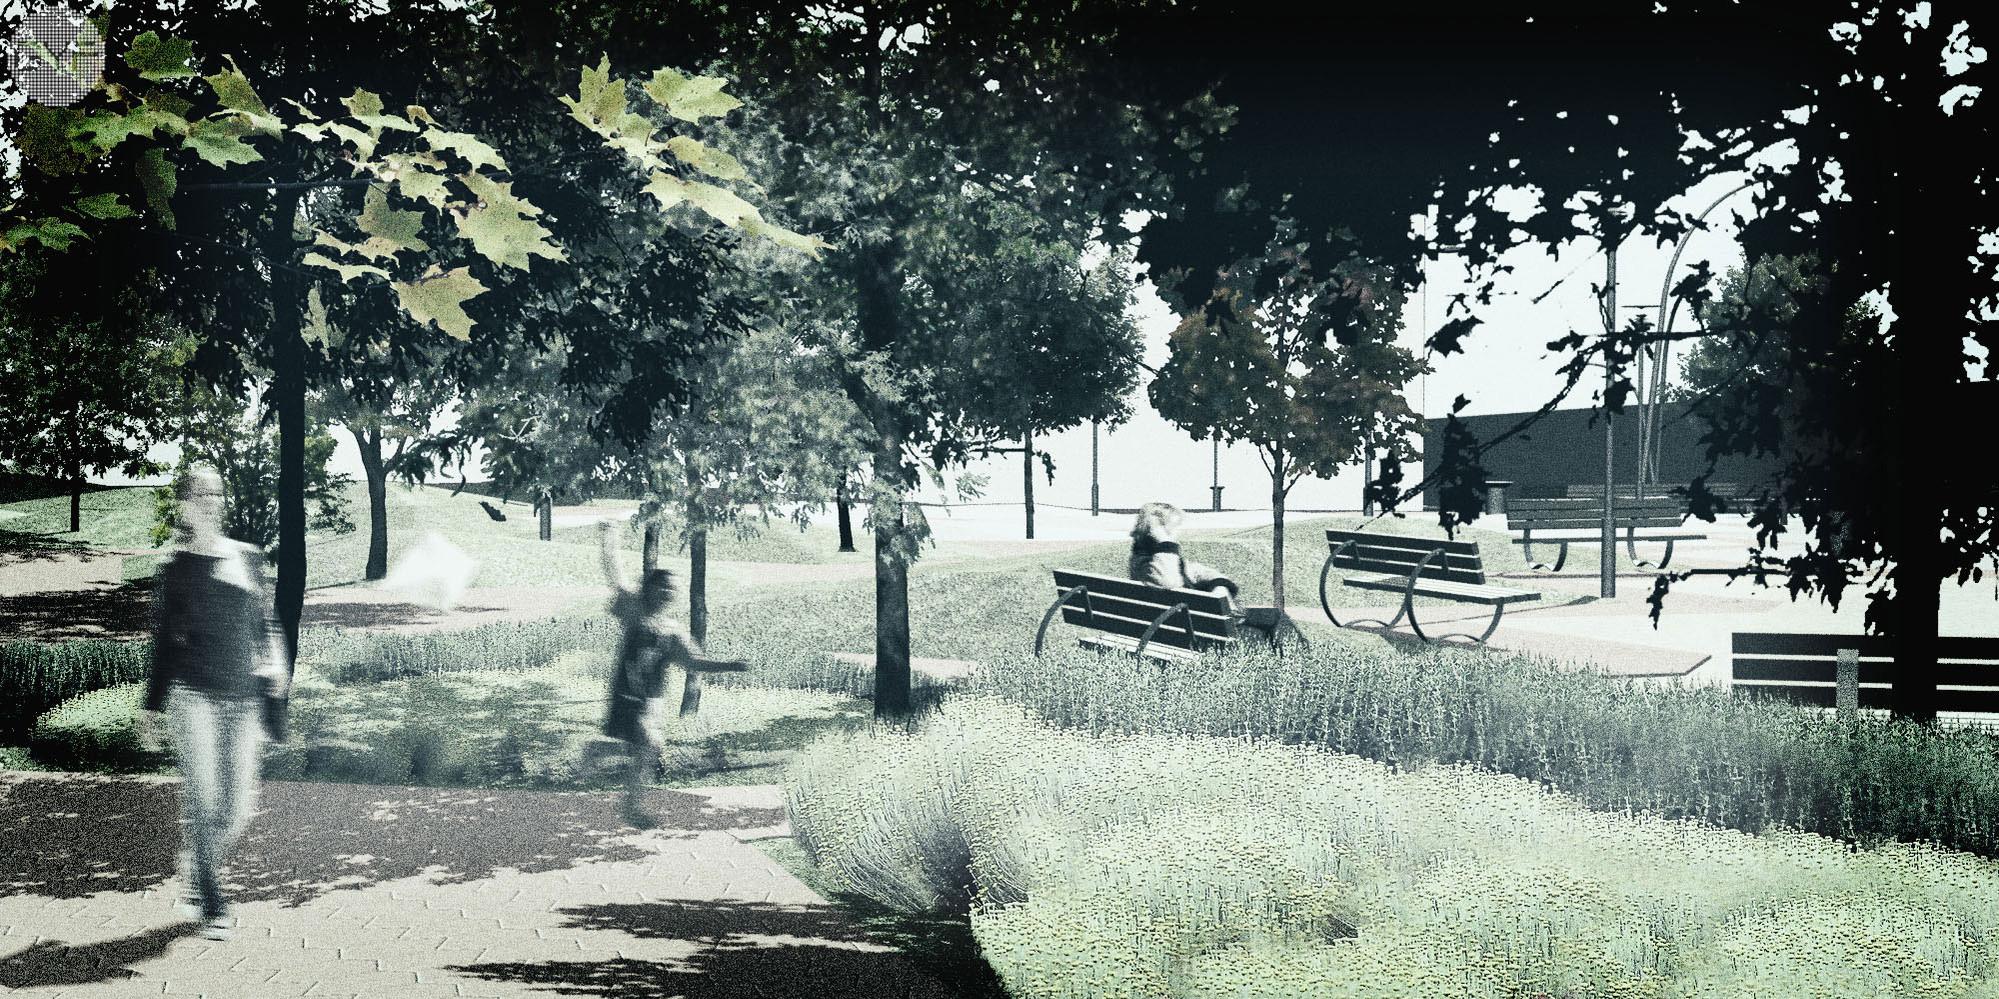 City park Parque del Agua